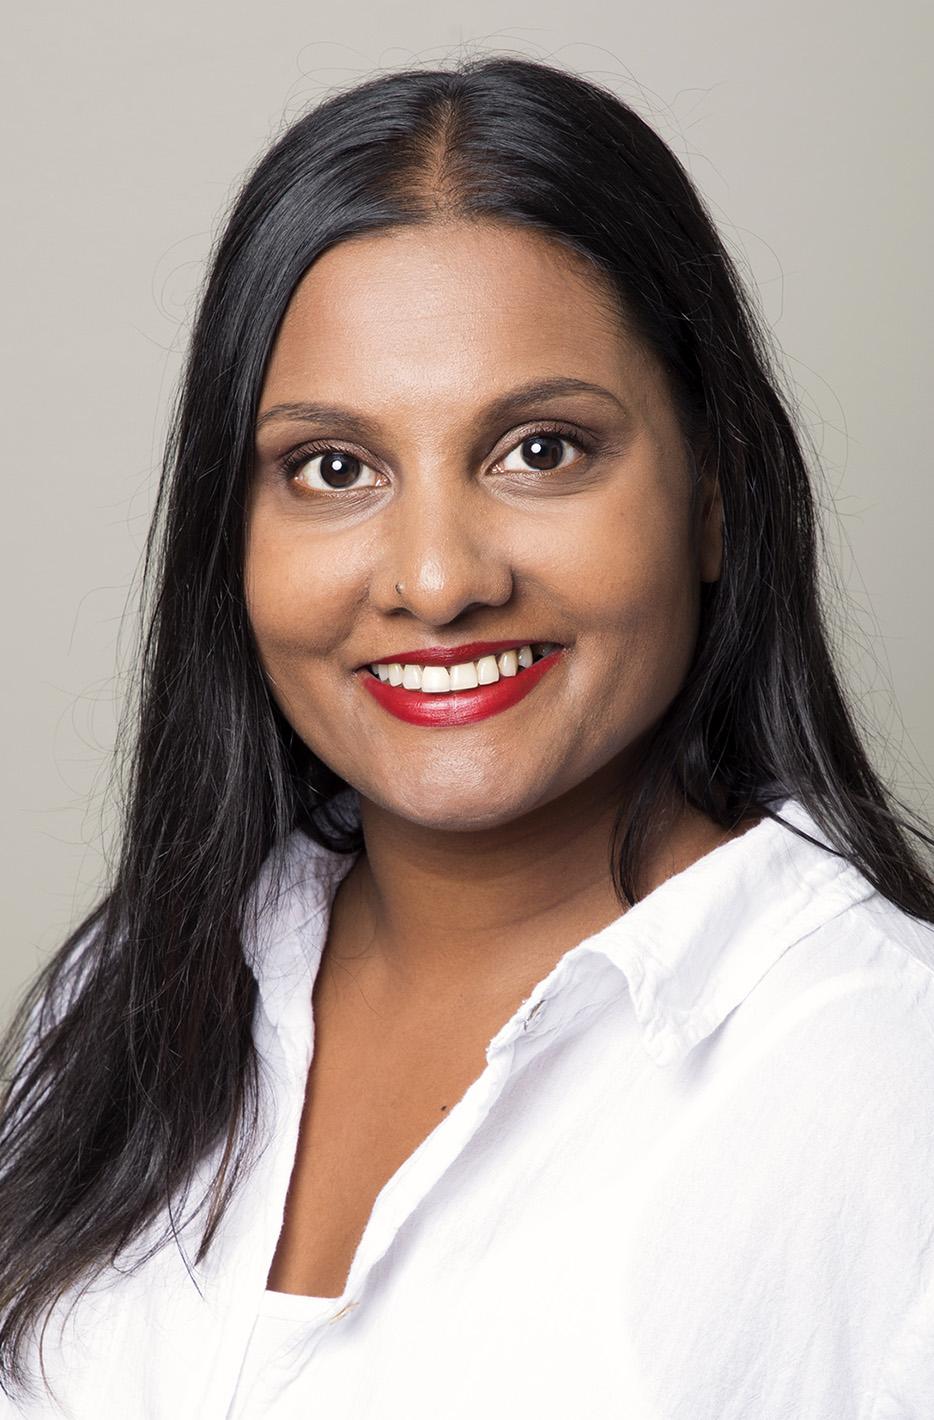 Prieshka Taylor, marketing manager